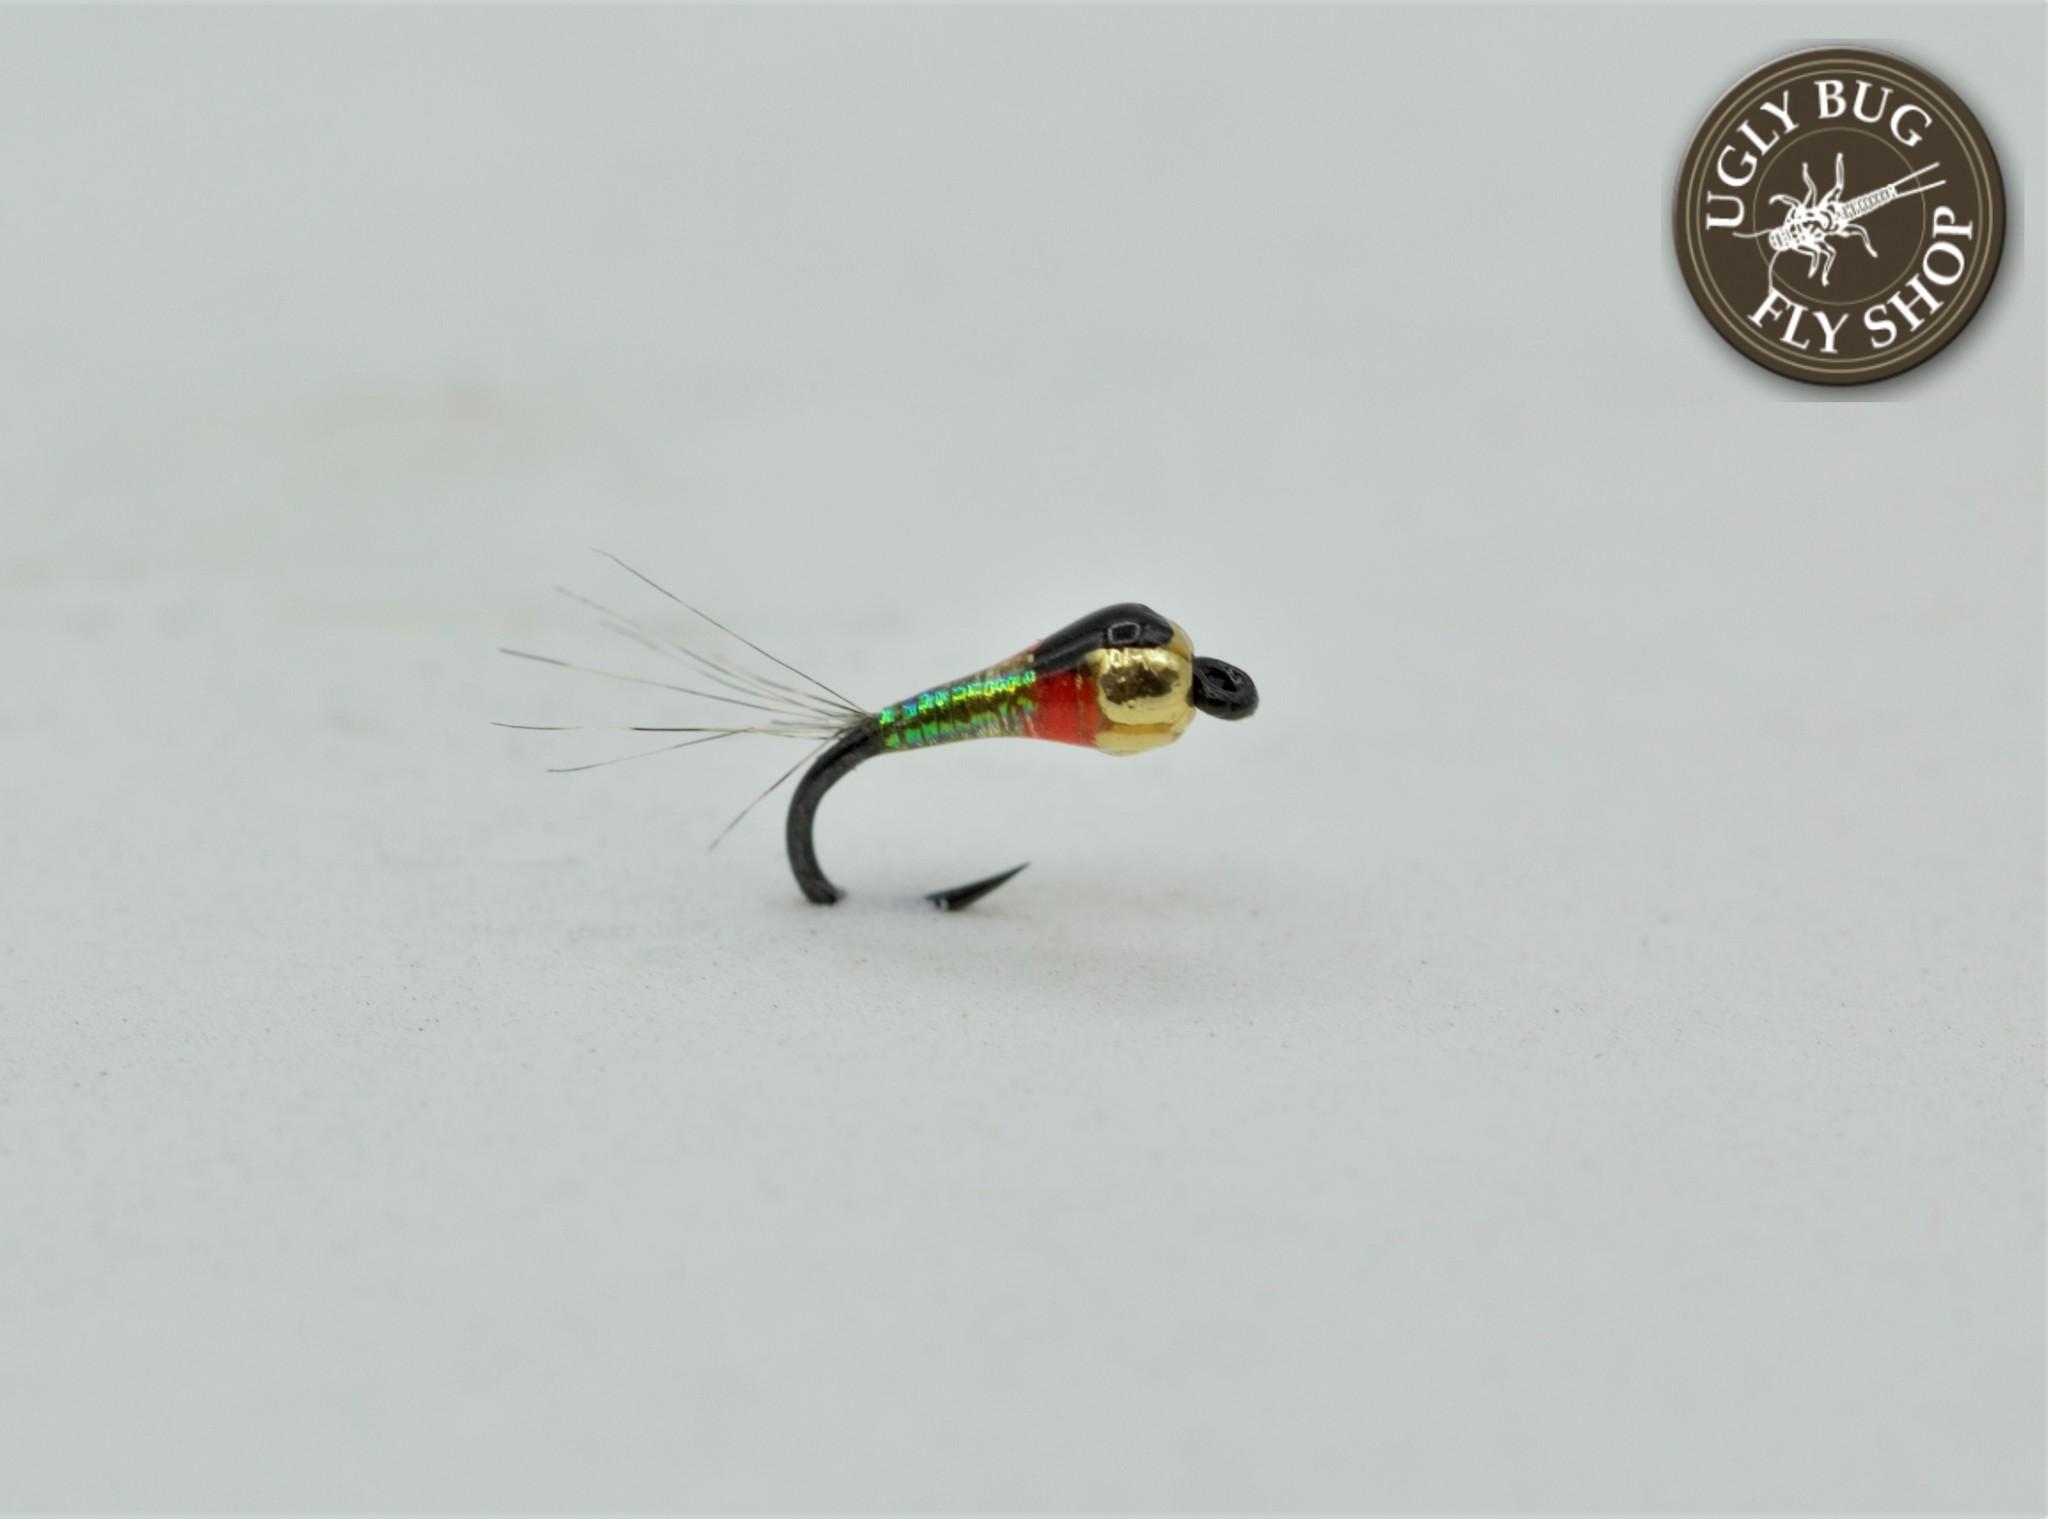 Ugly Bug Fly Shop PERDIGON MAKTIMA